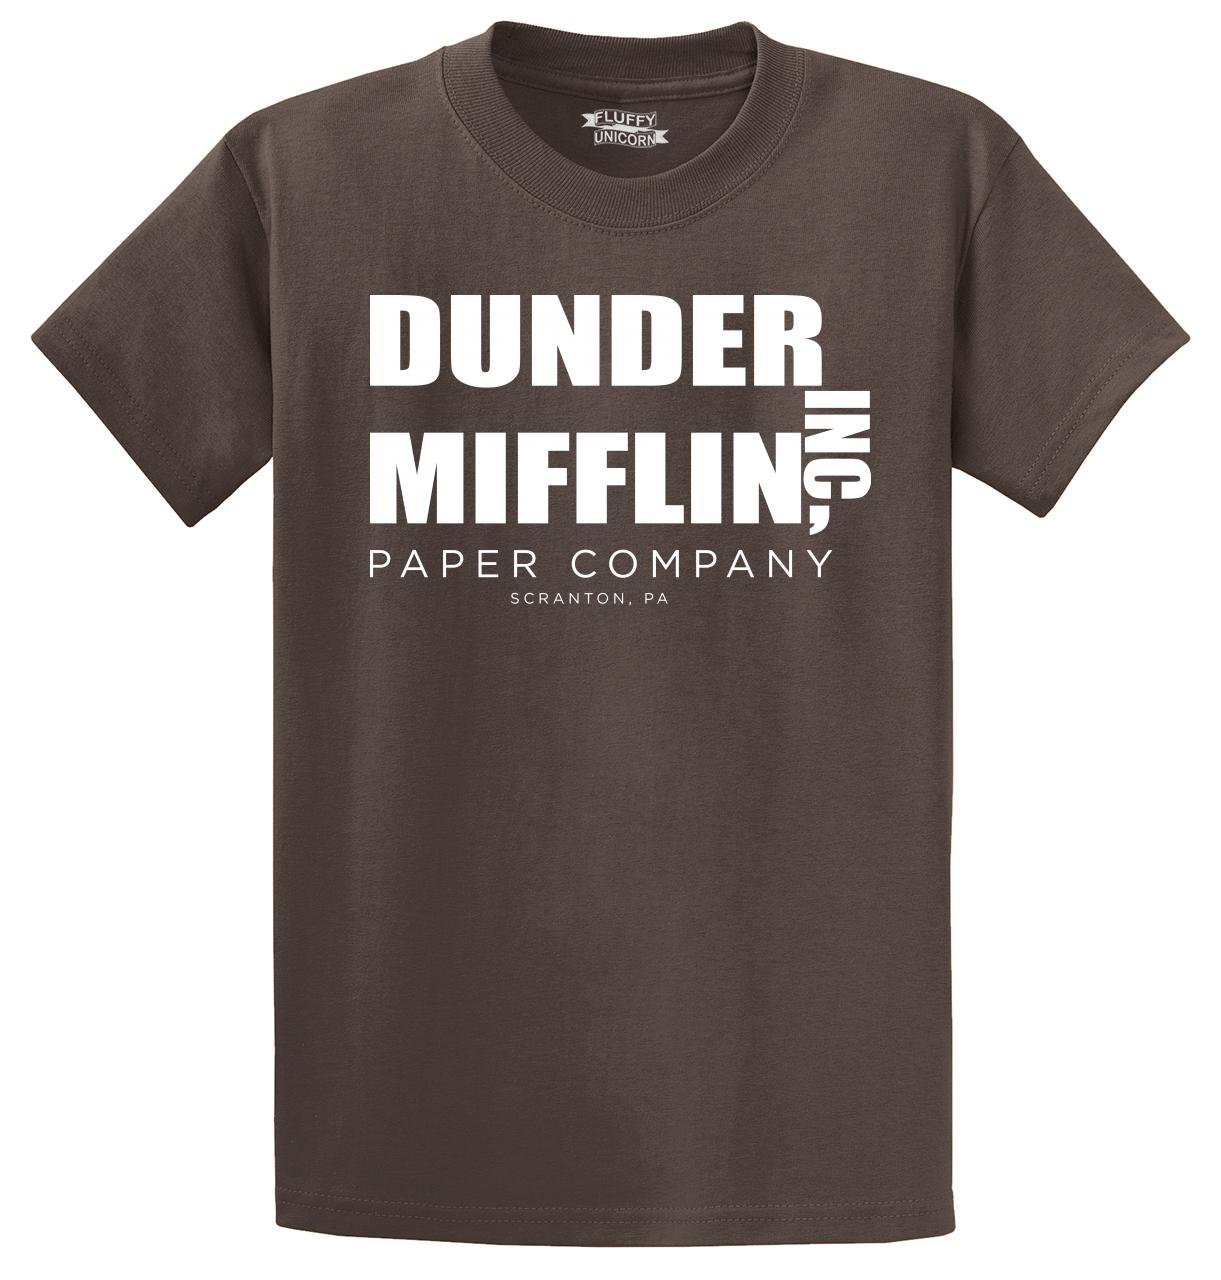 Dunder-Mifflin-Inc-A-Paper-Company-Funny-T-Shirt-TV-Show-Holiday-Gift-Tee-Shirt thumbnail 23